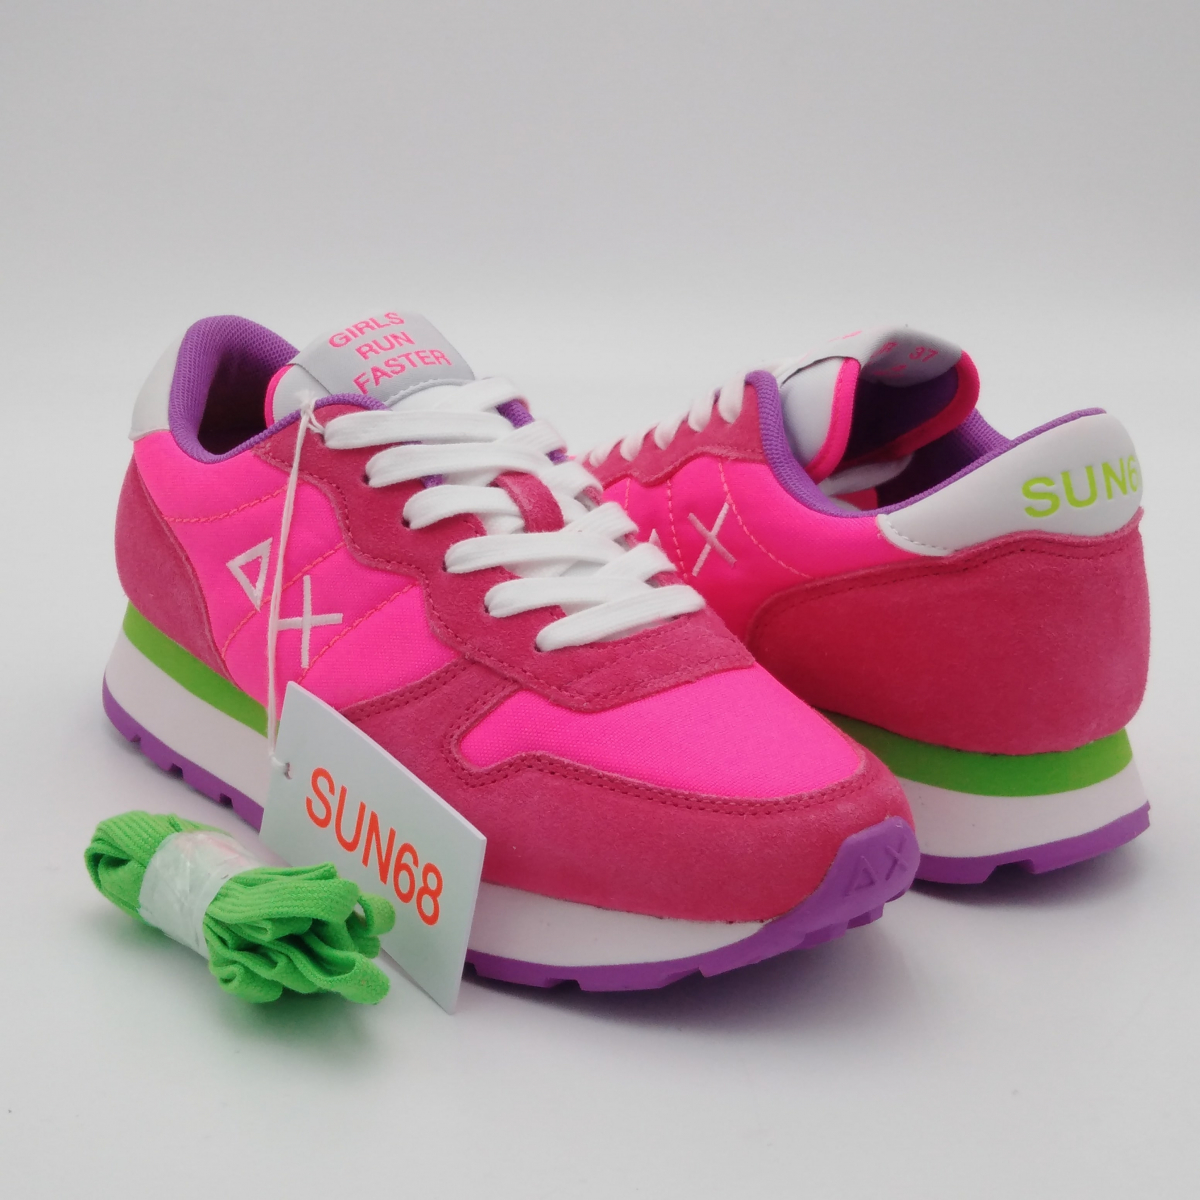 Sun 68 -Sneaker Donna Ally...